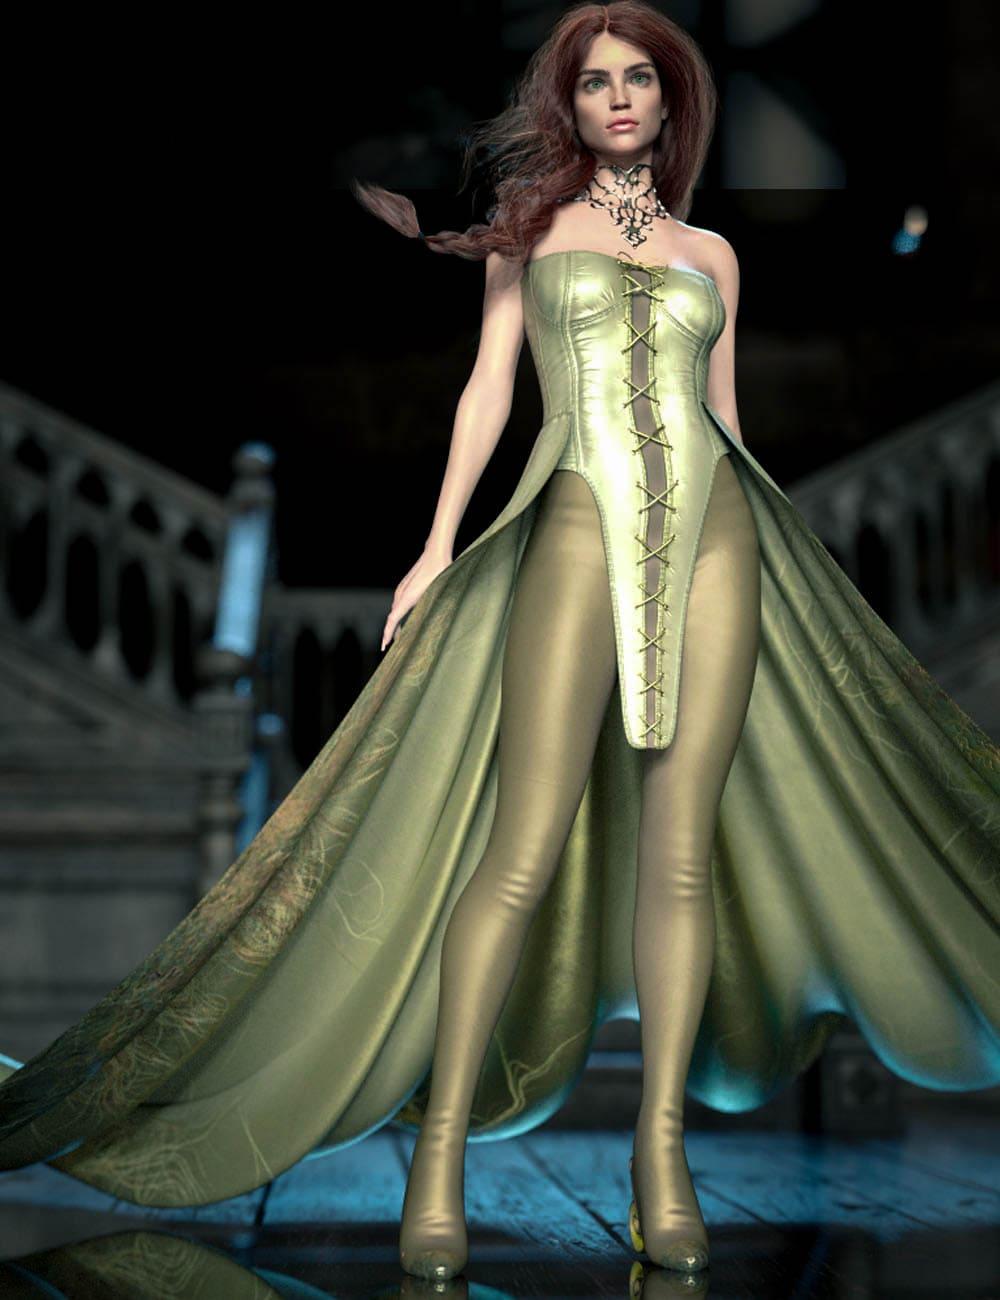 CB Sophia dForce Clothing Set for Genesis 8 and 8.1 Females_DAZ3D下载站